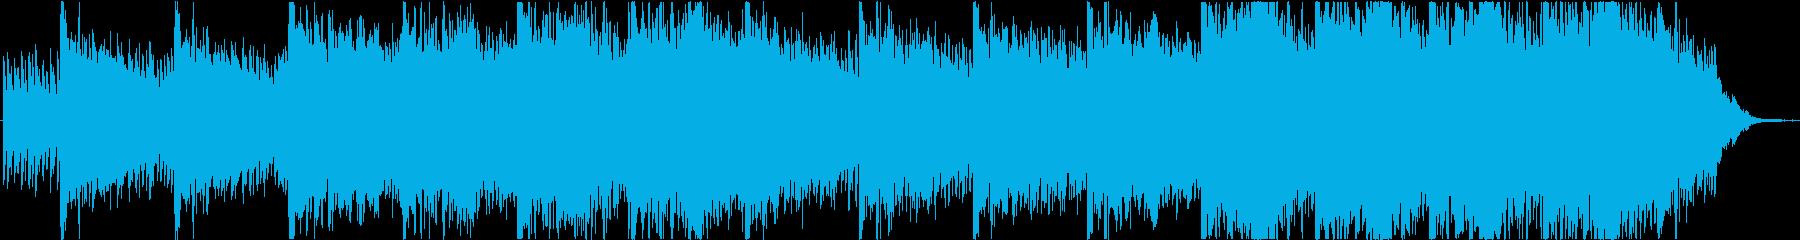 Piano music trackの再生済みの波形